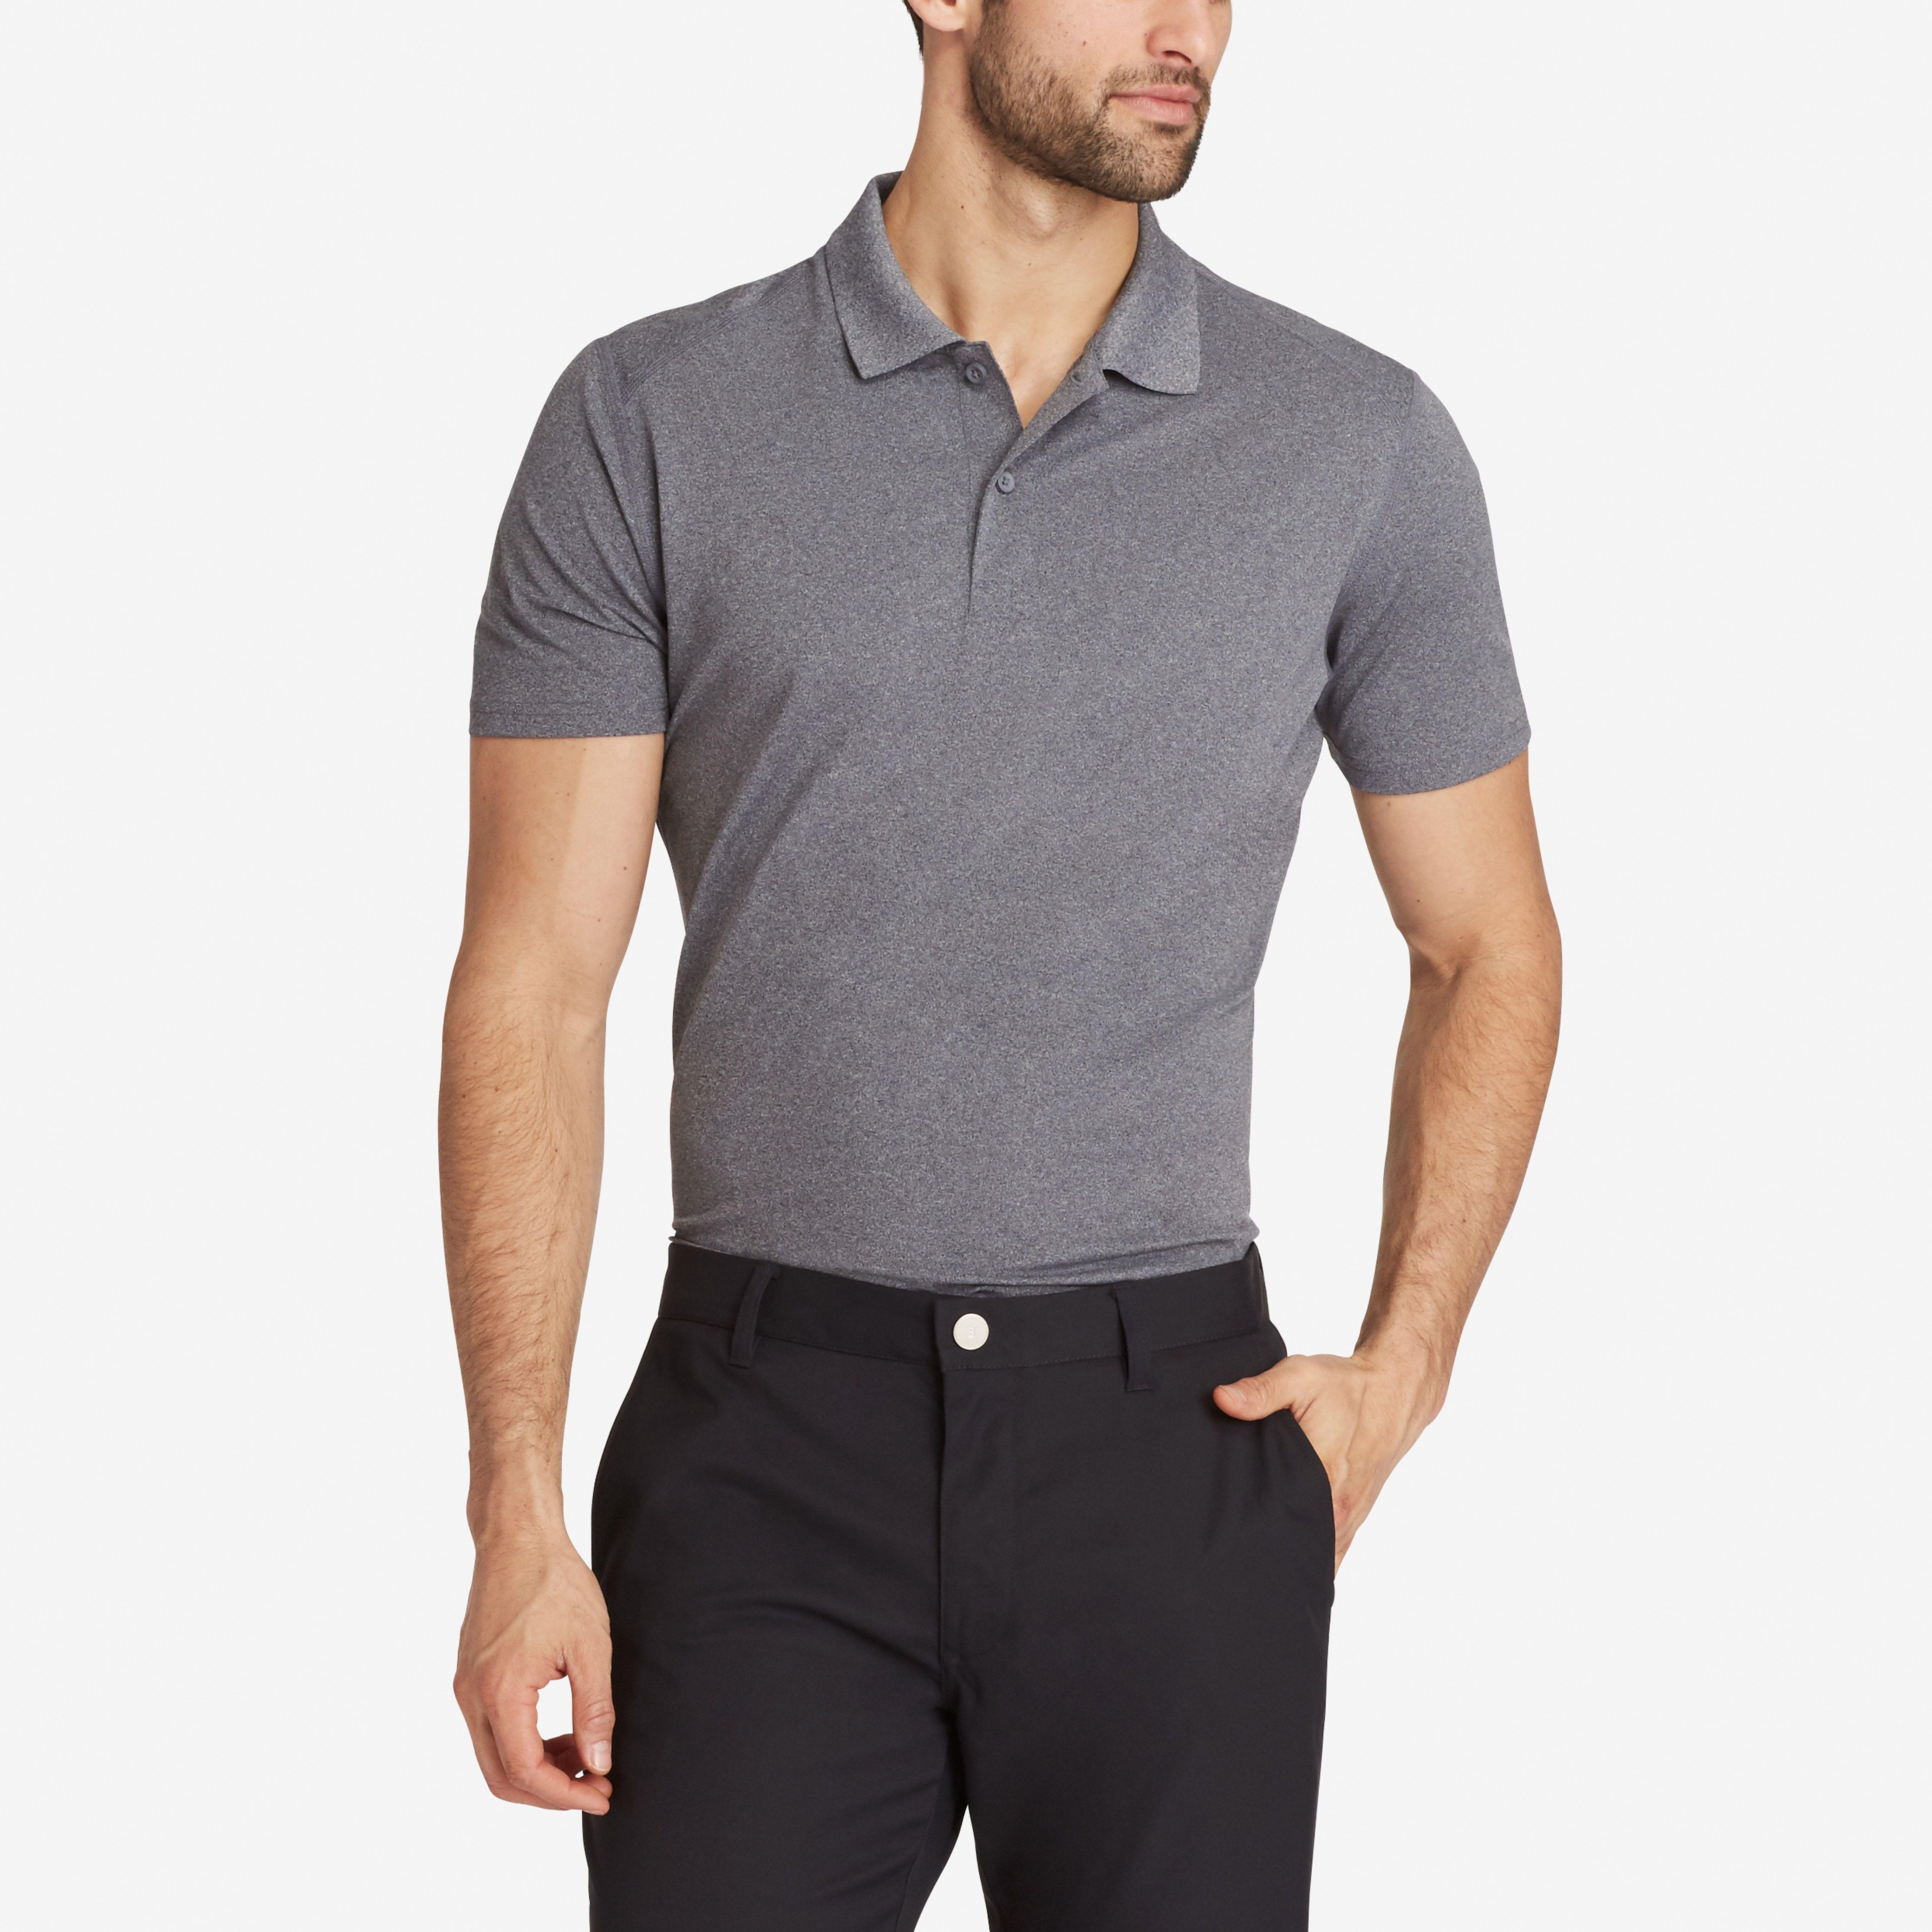 24c90a0a6 Bonobos - Flatiron Golf Polo- Performance athletic fabric